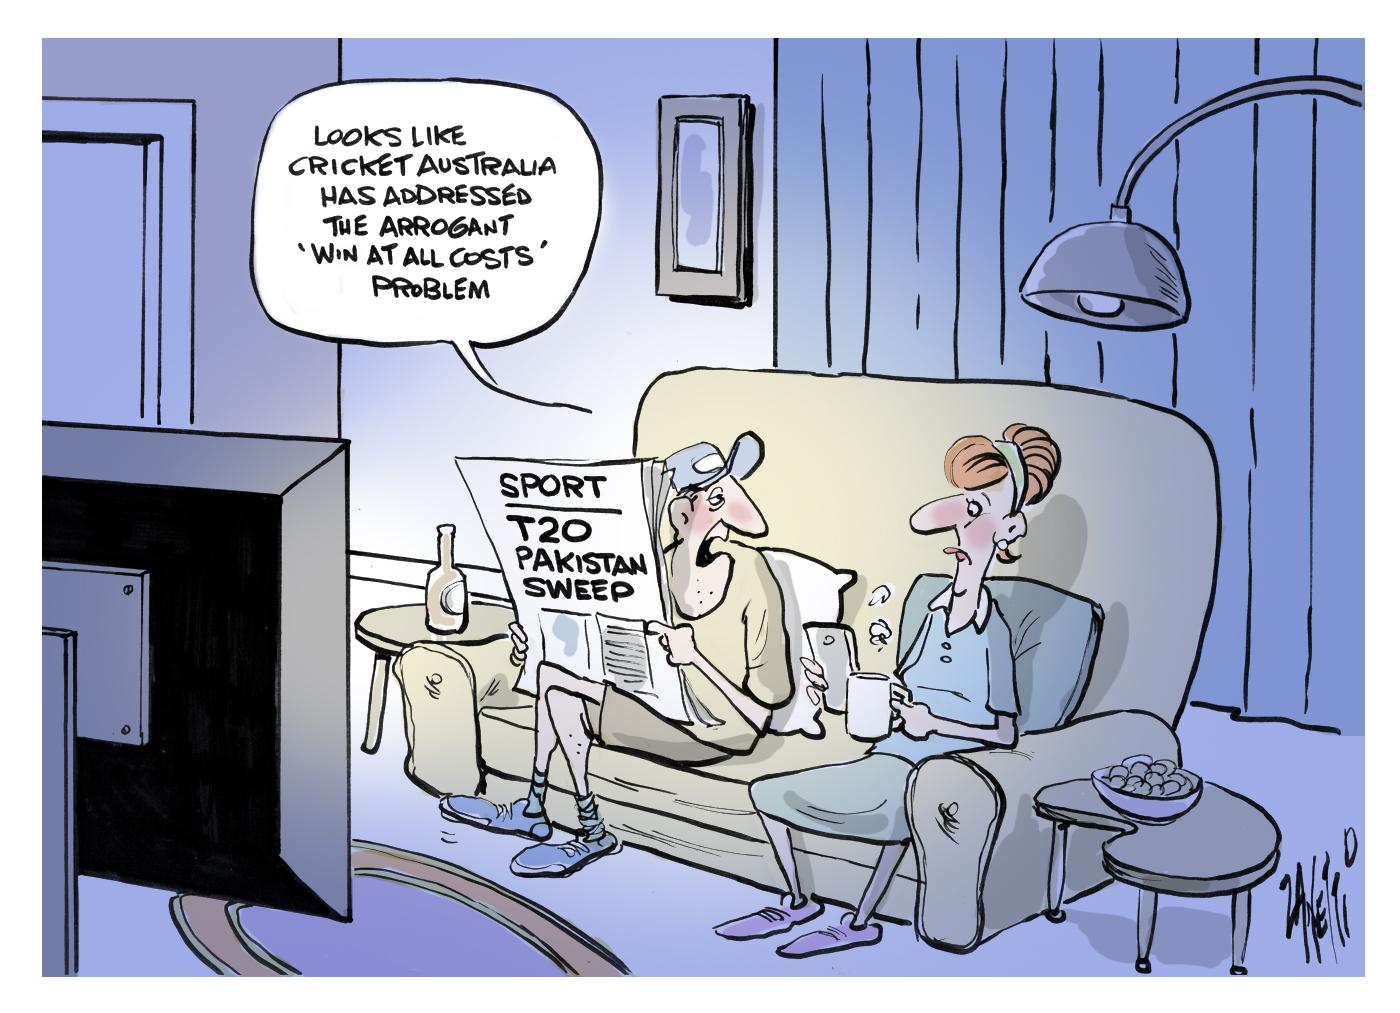 Arrogant Cricket Australia